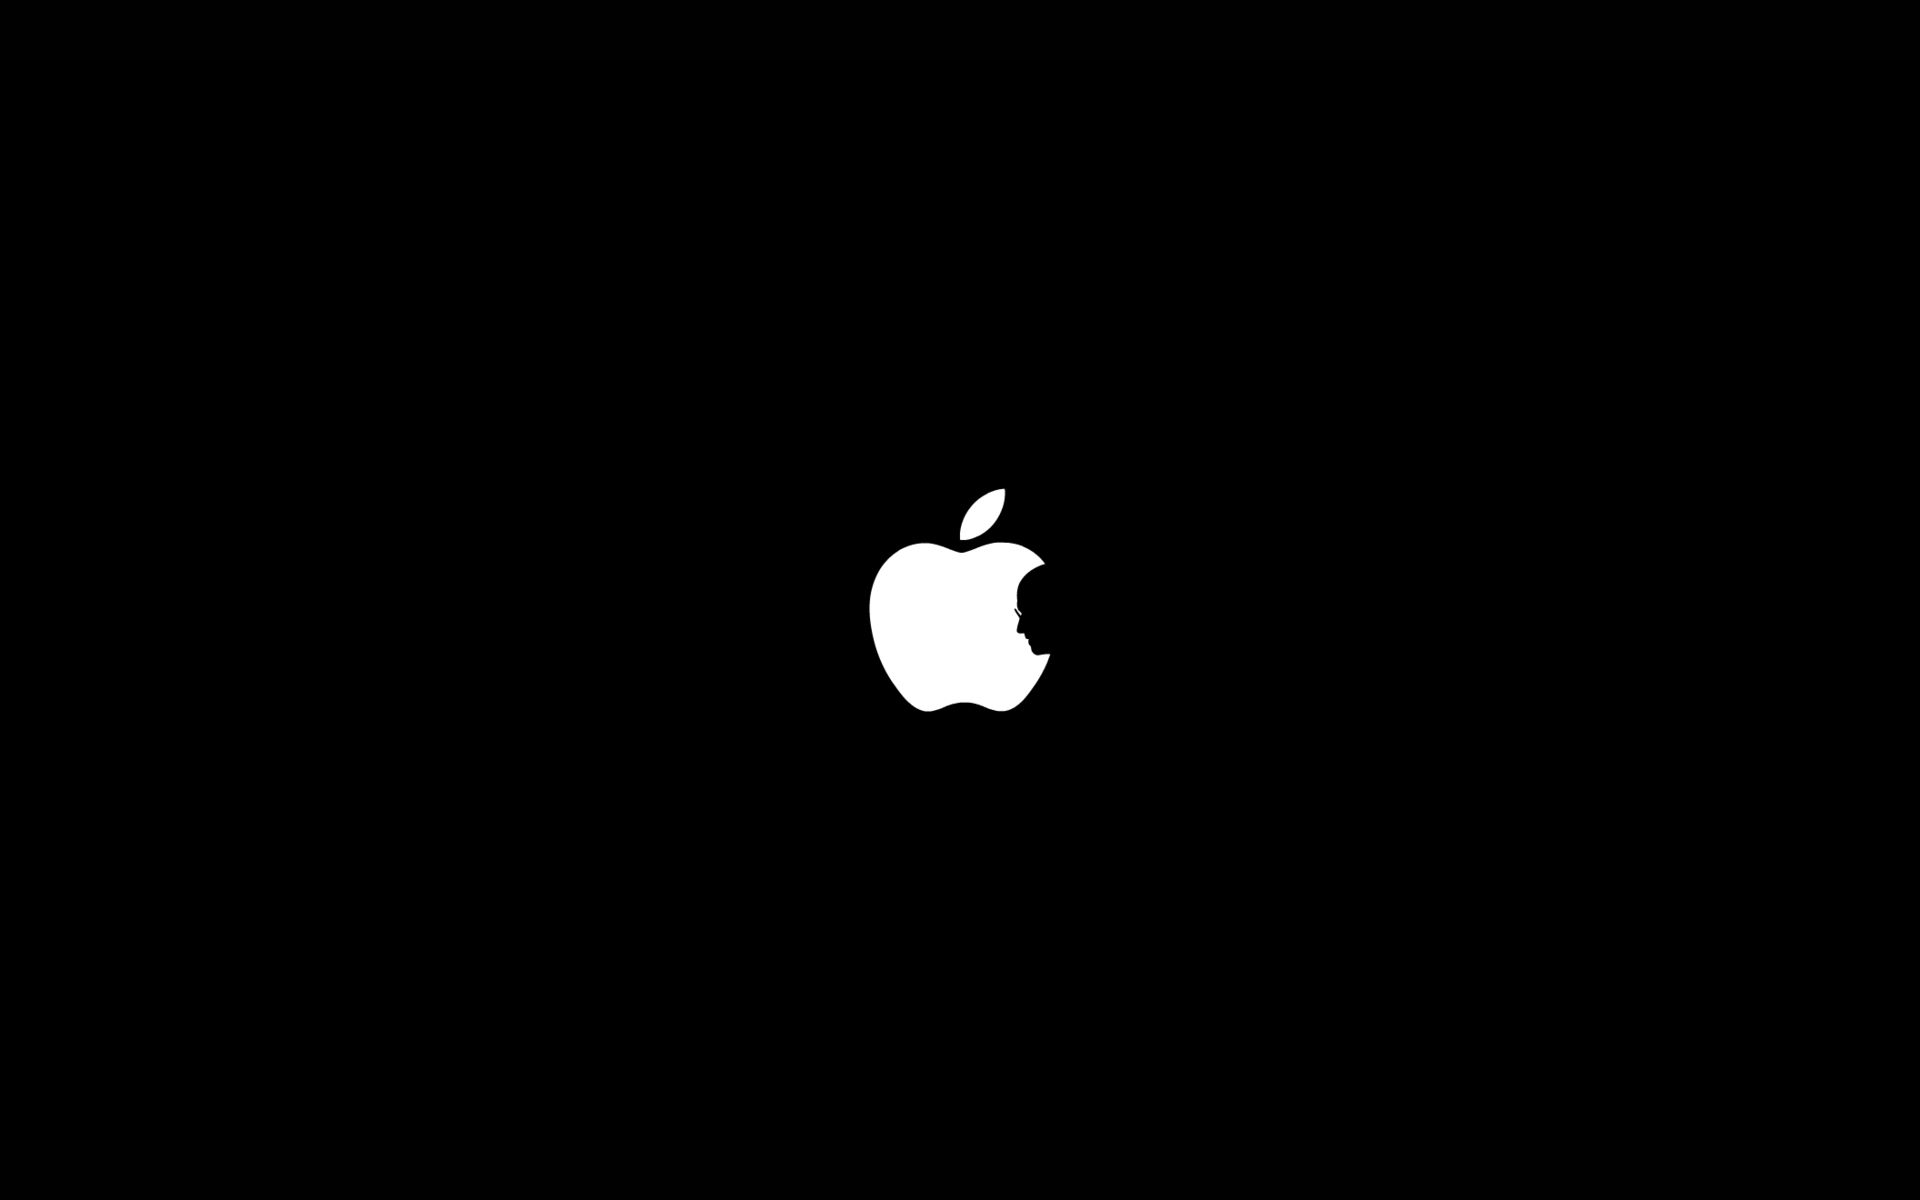 10 Most Popular Hd Apple Logo Wallpaper Full Hd 1920 1080 For Pc